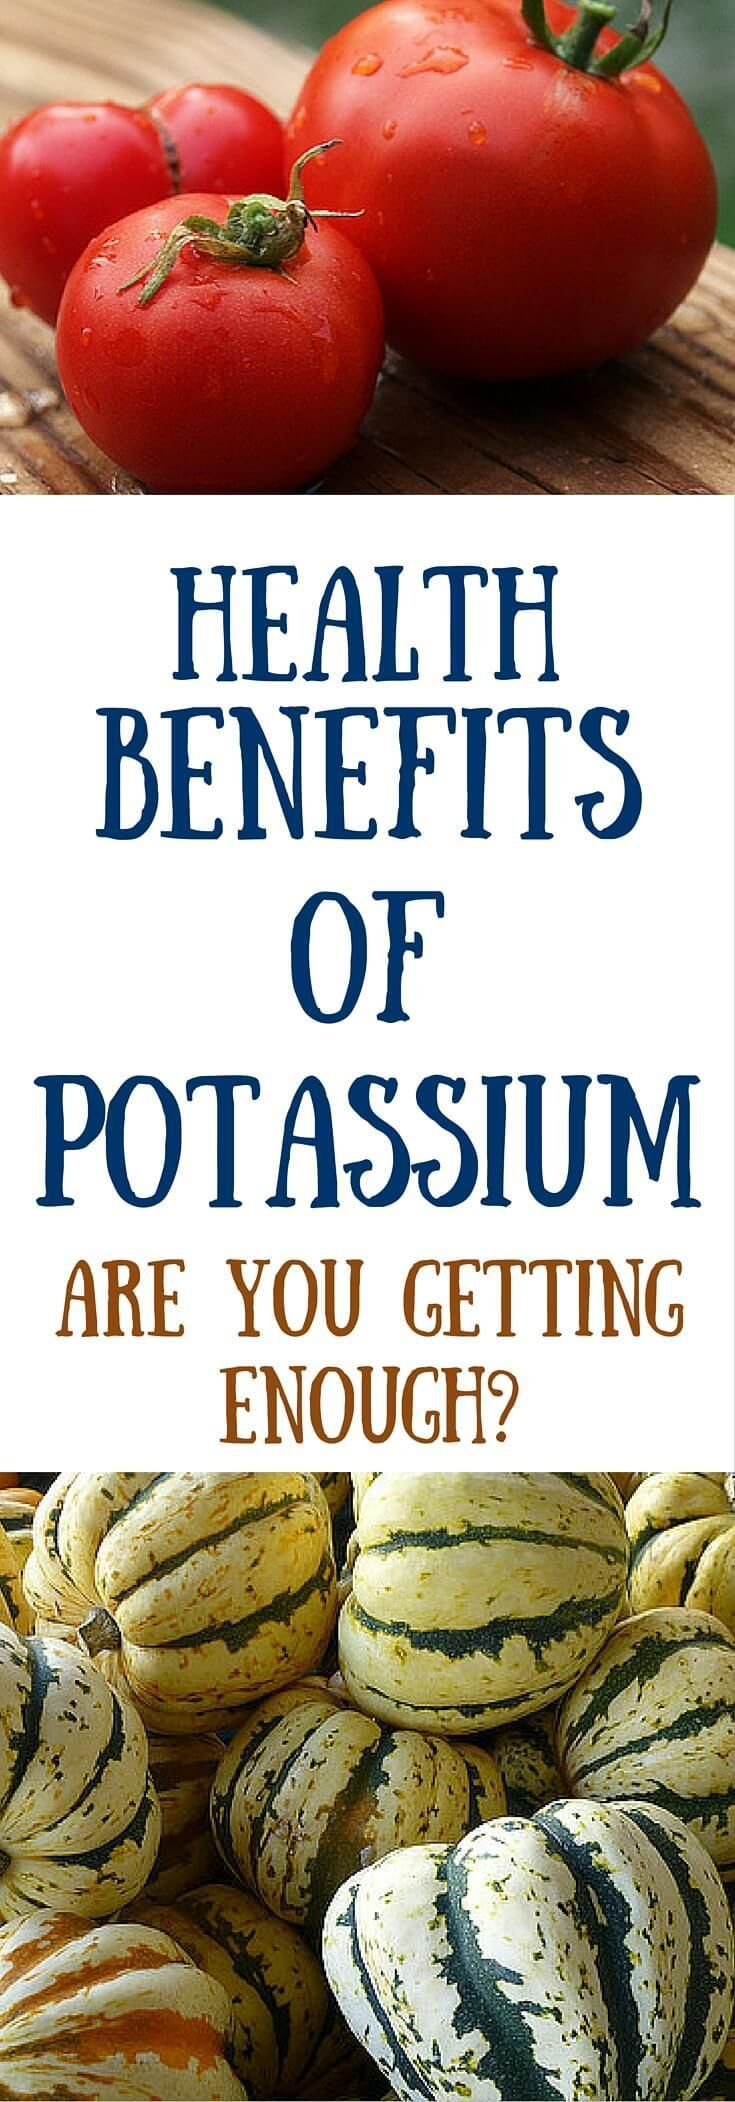 Health benefits of potassium. Getting enough potassium is critical to good healt... 1